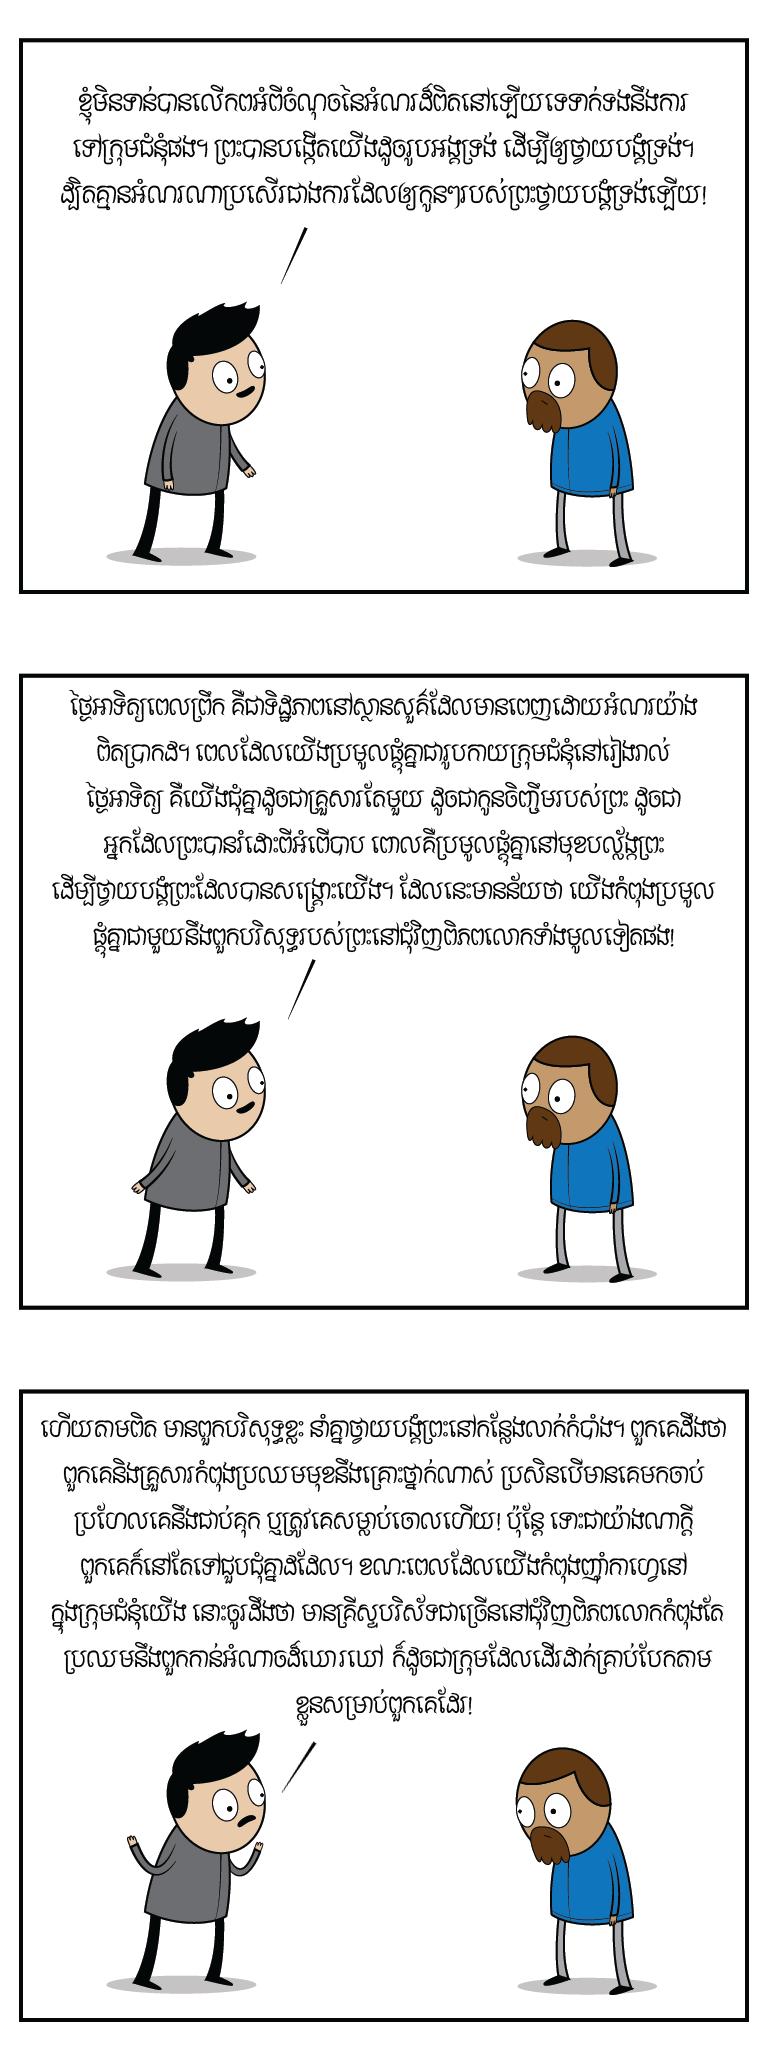 2015-03-03-sleep-in3-khmer-3-3